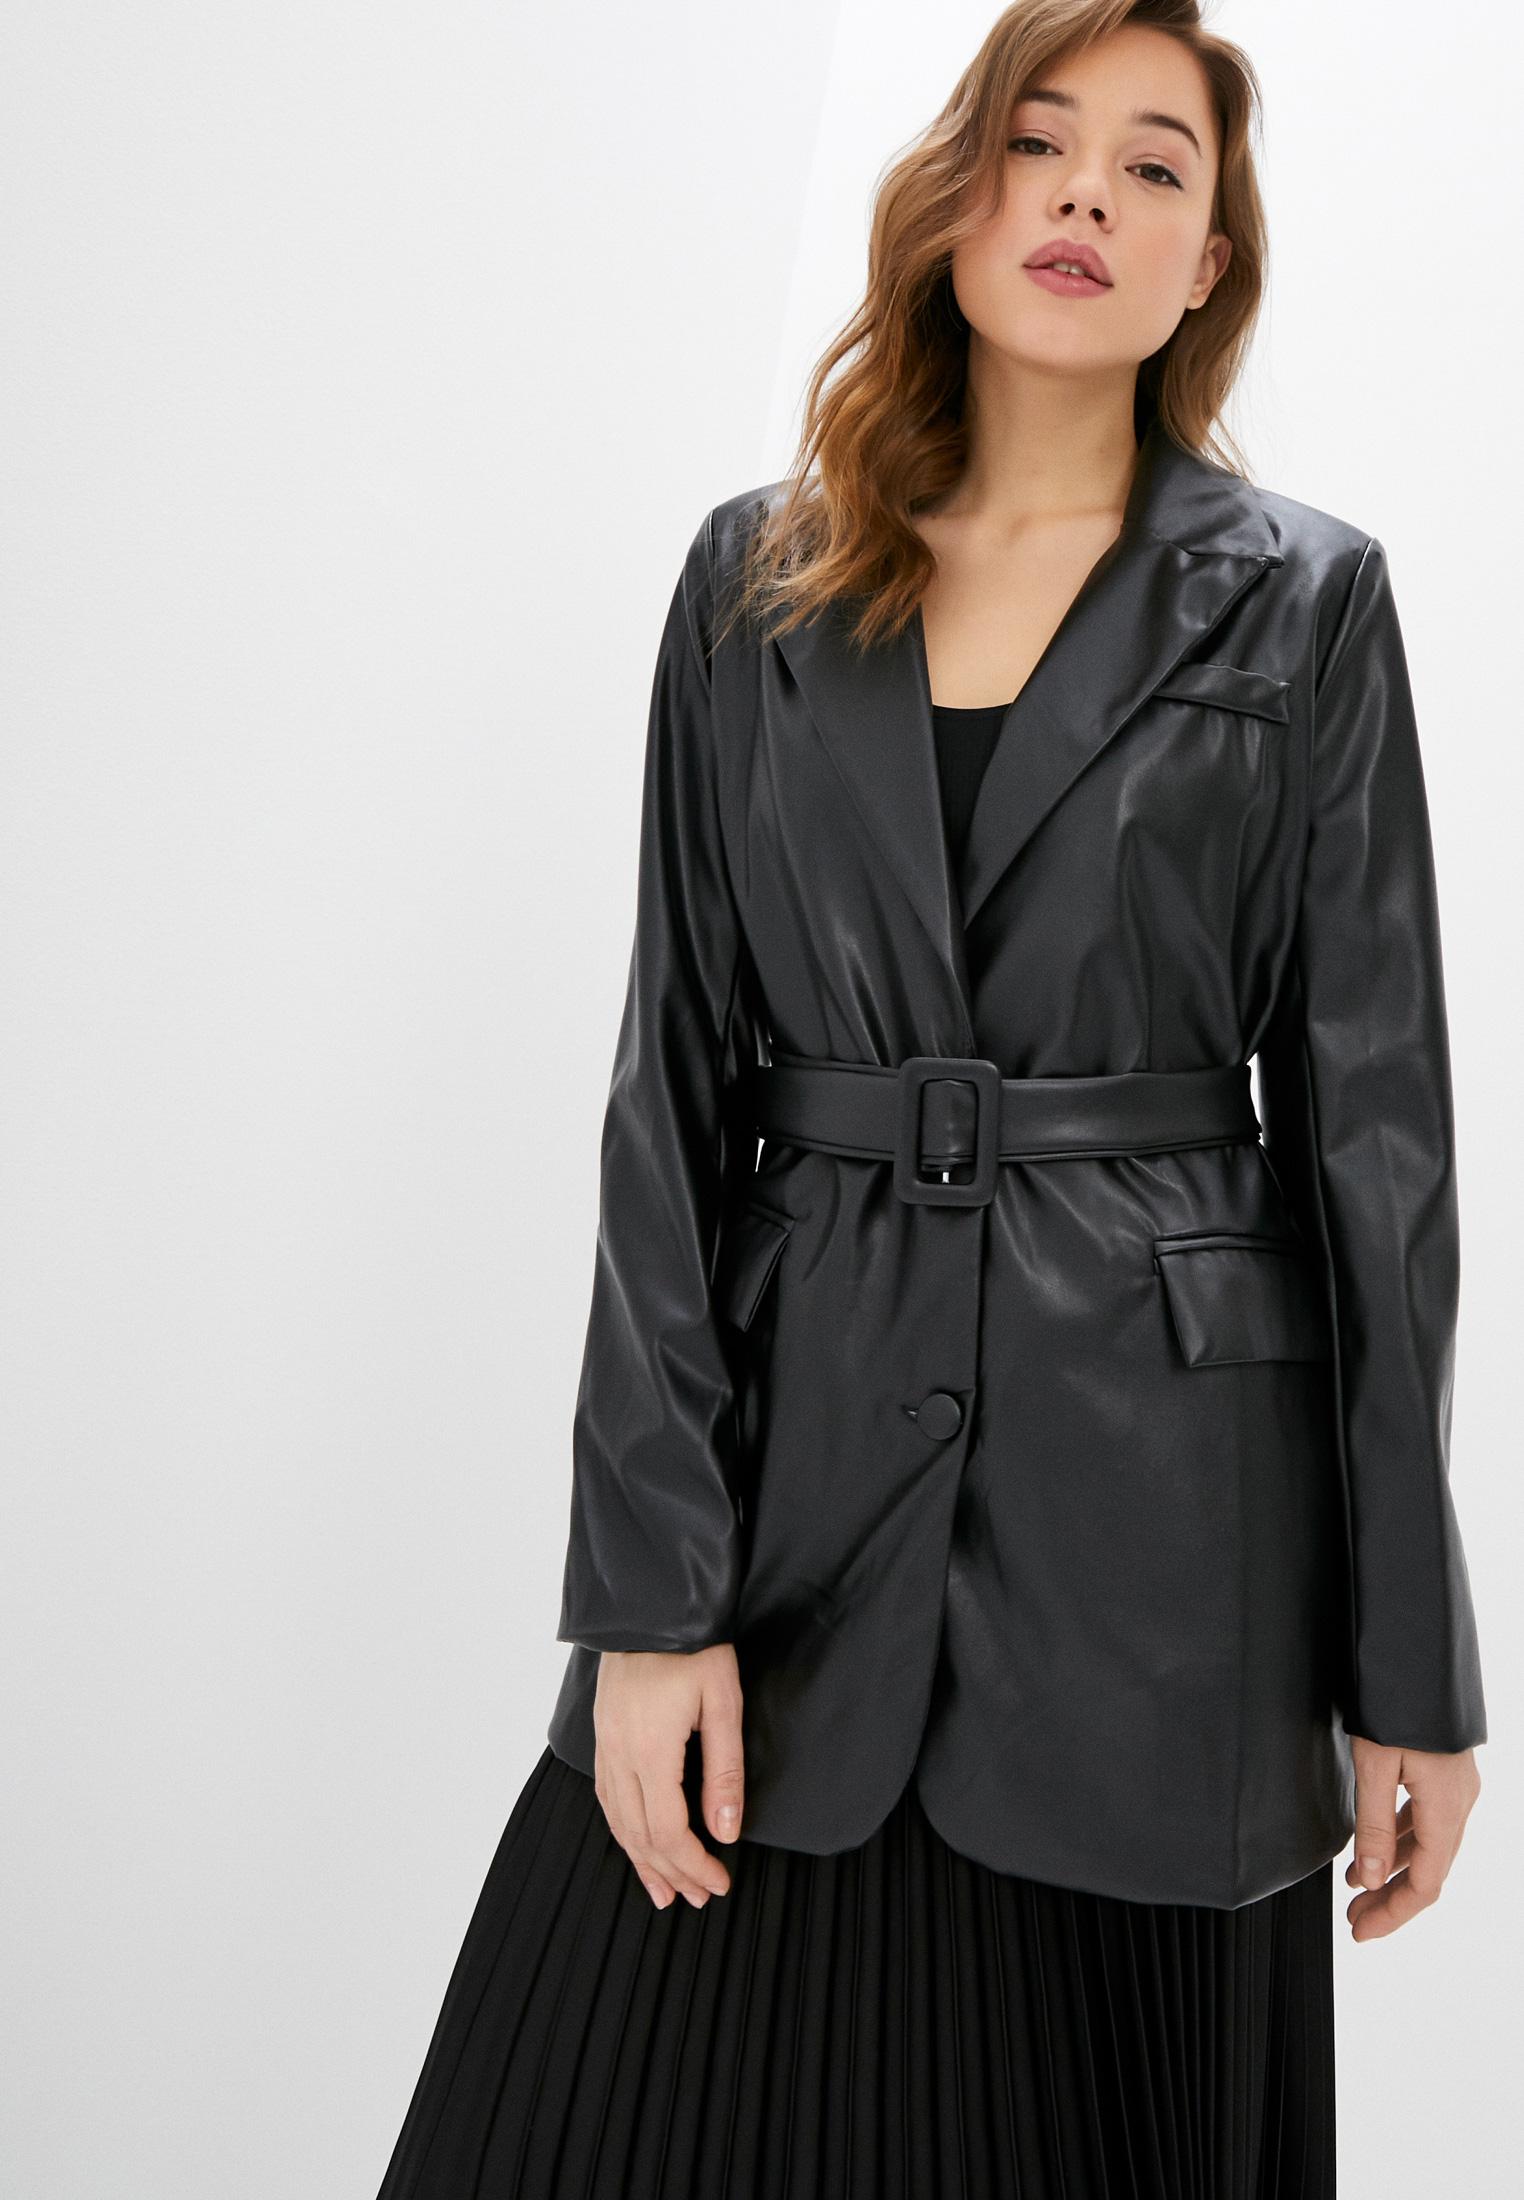 Кожаная куртка Miss Gabby 4040